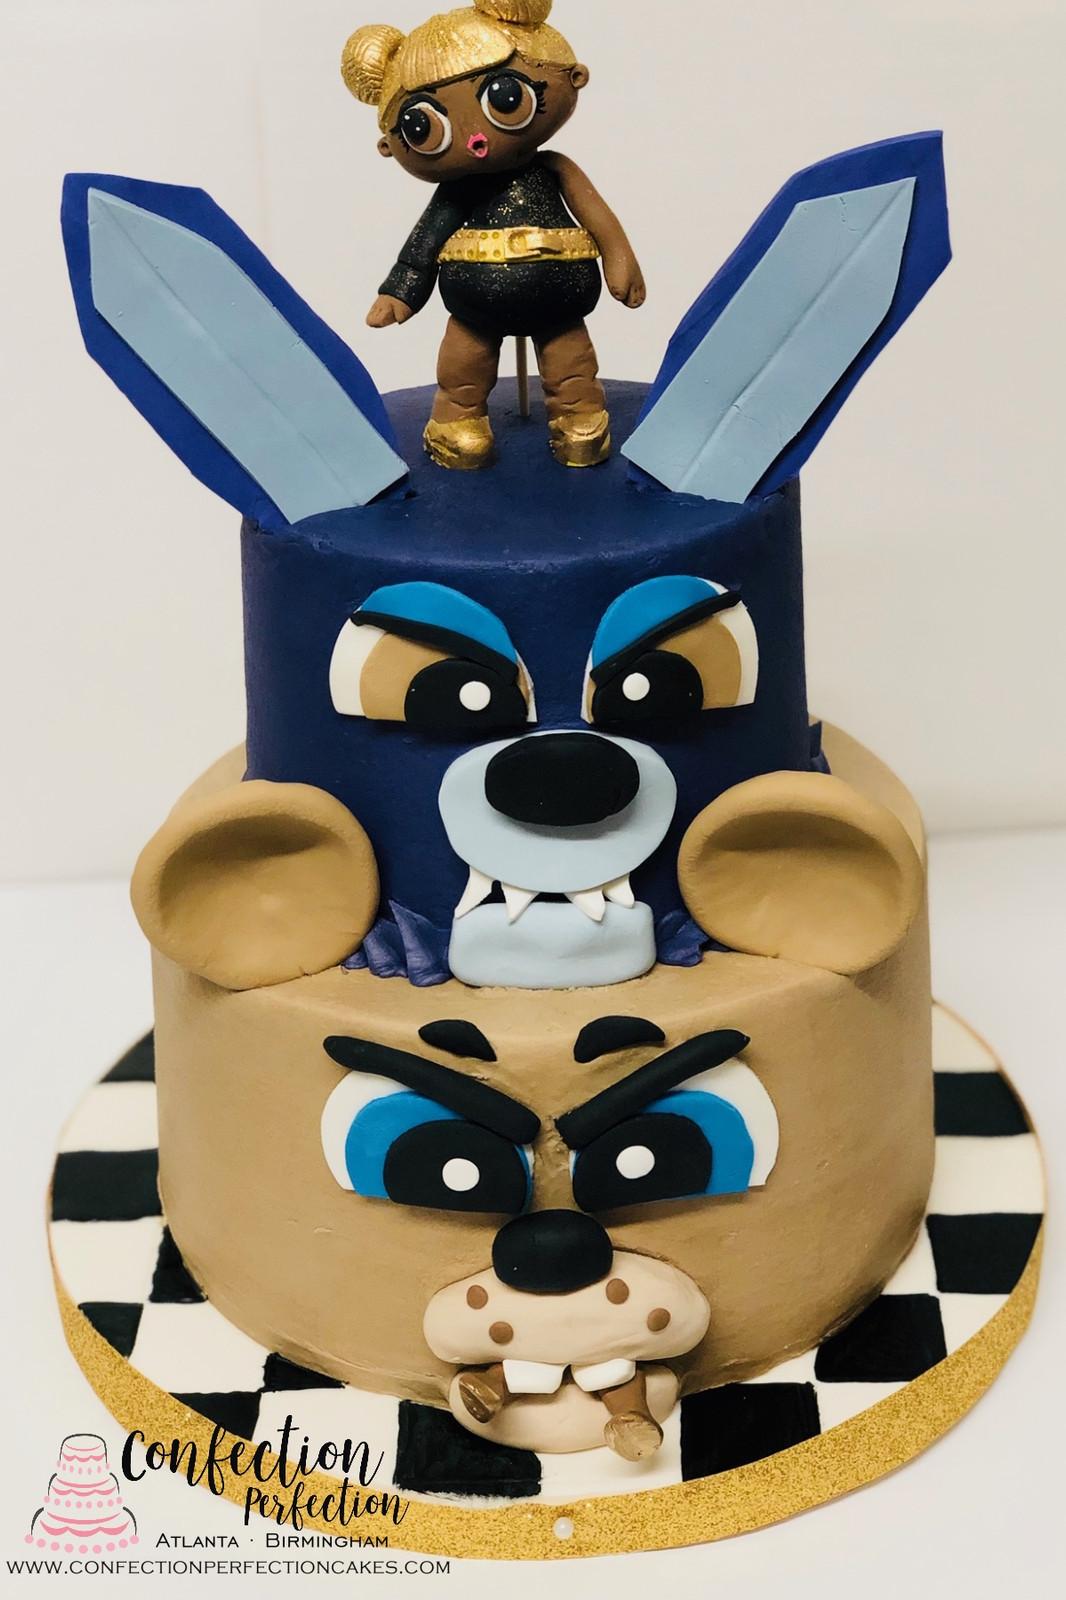 Five Nights At Freddys LOL Doll 2 Tier Cake CBG 159